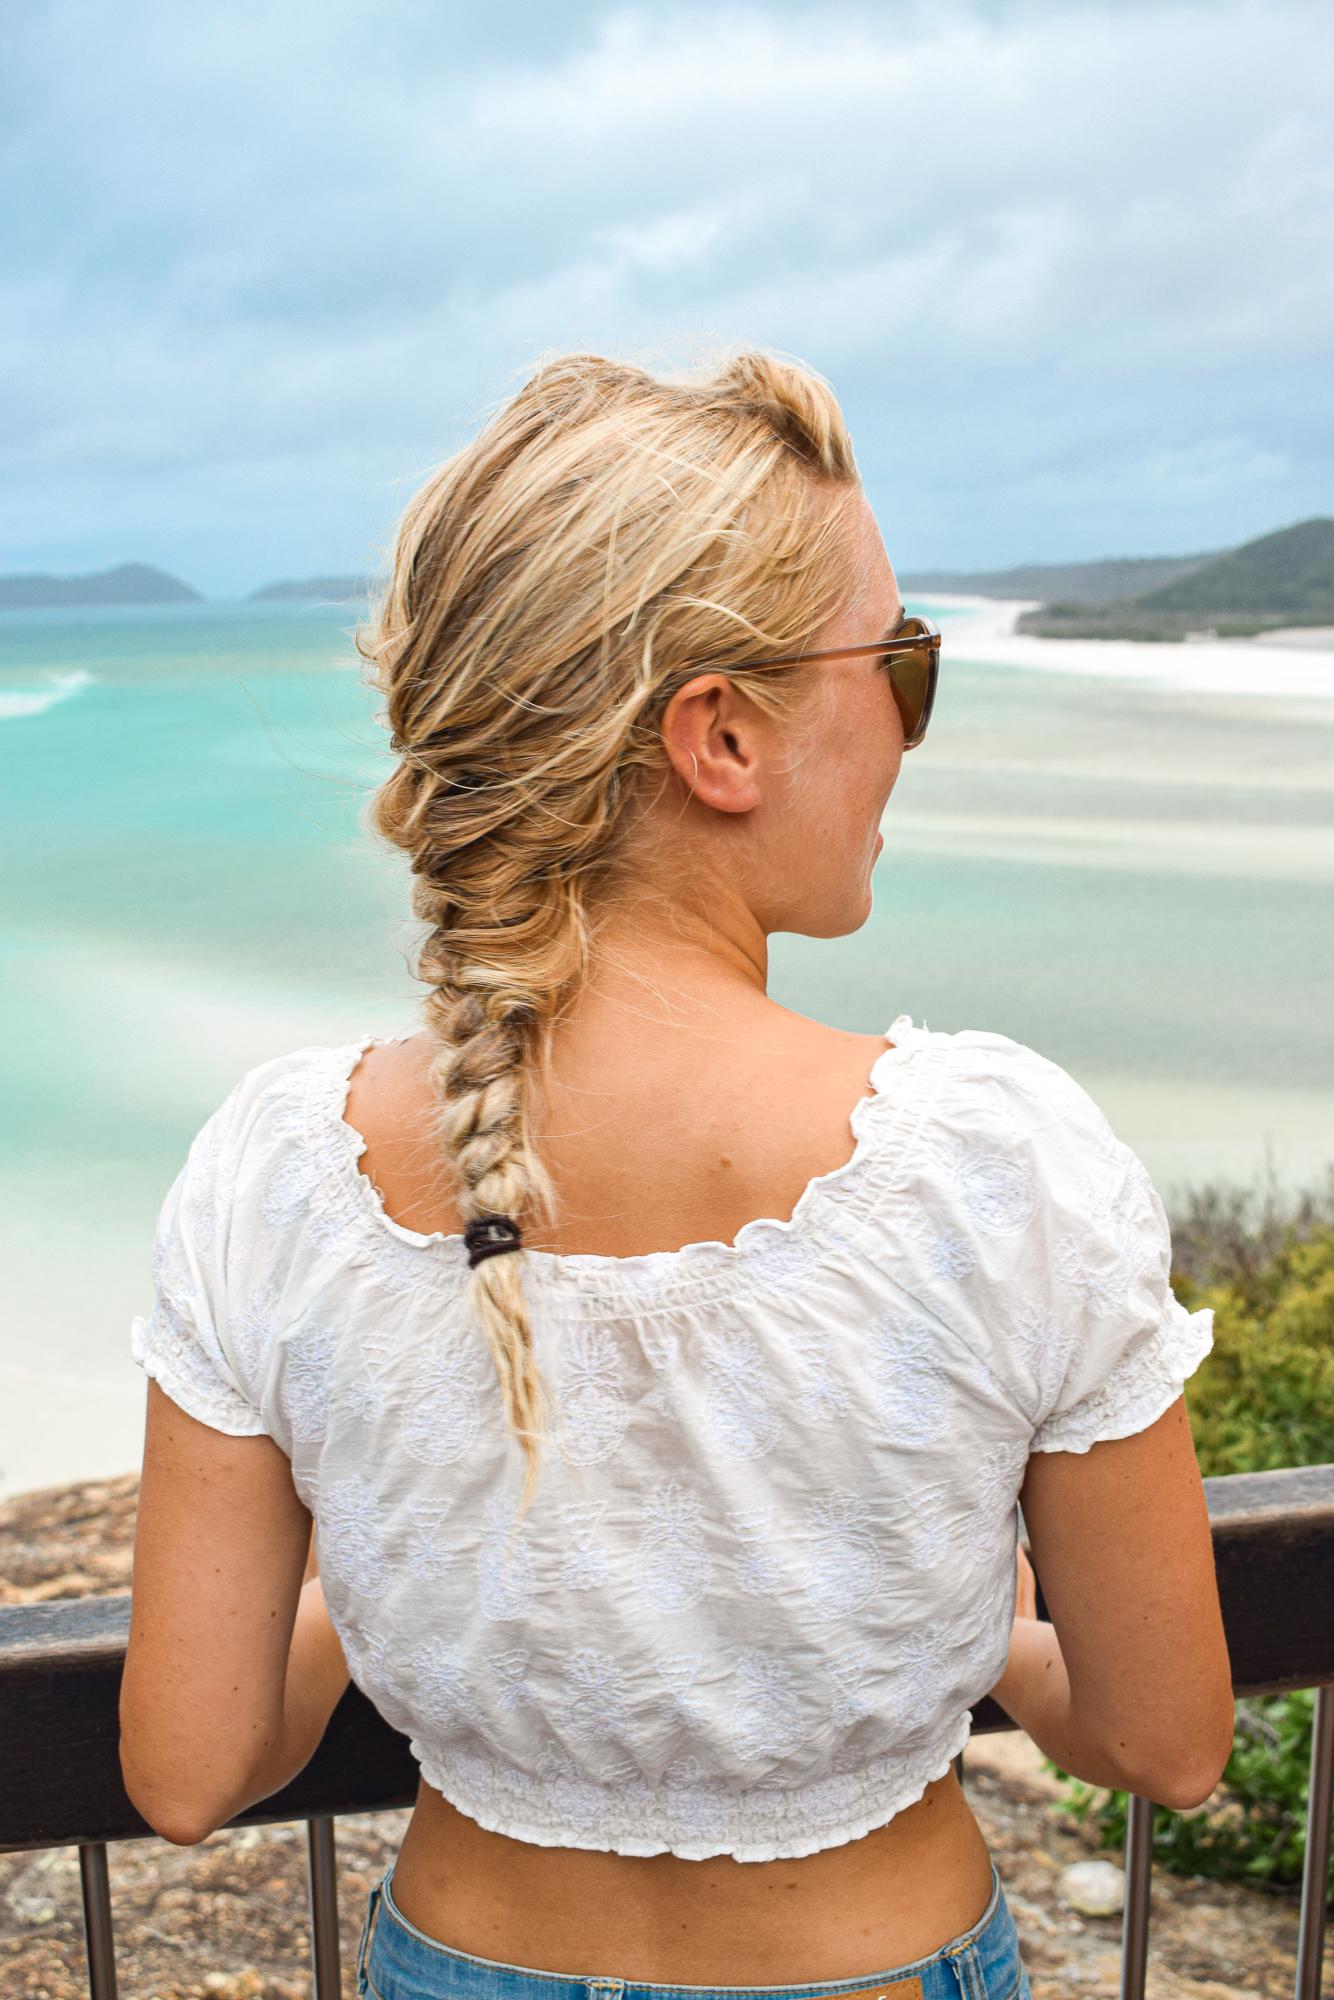 jag tittar ut över whitehaven beach i whitsunday islands.